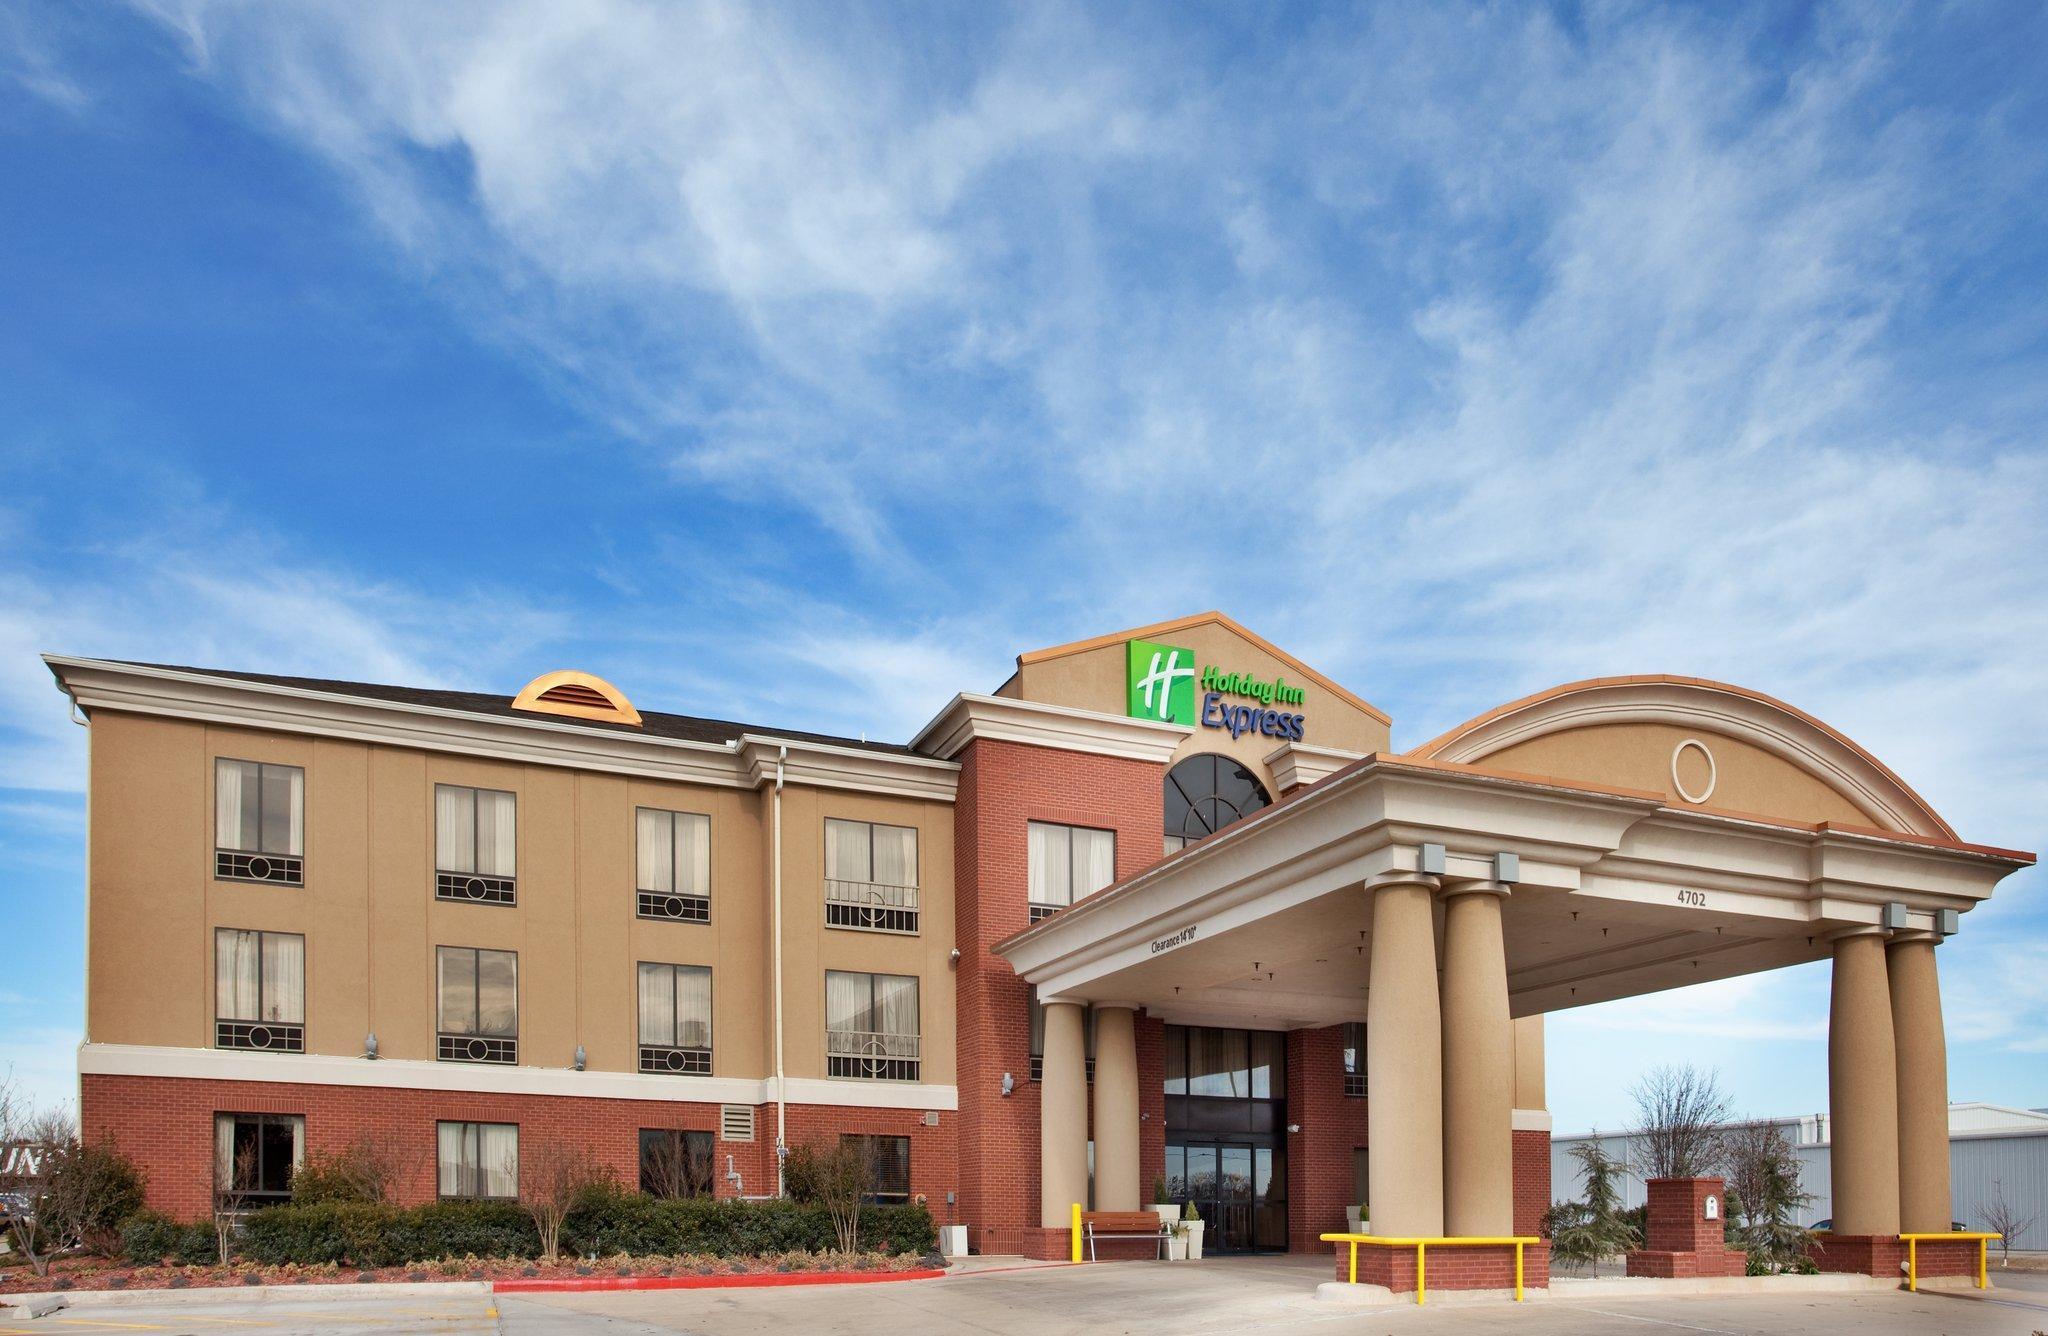 Holiday Inn Express Enid Highway 412